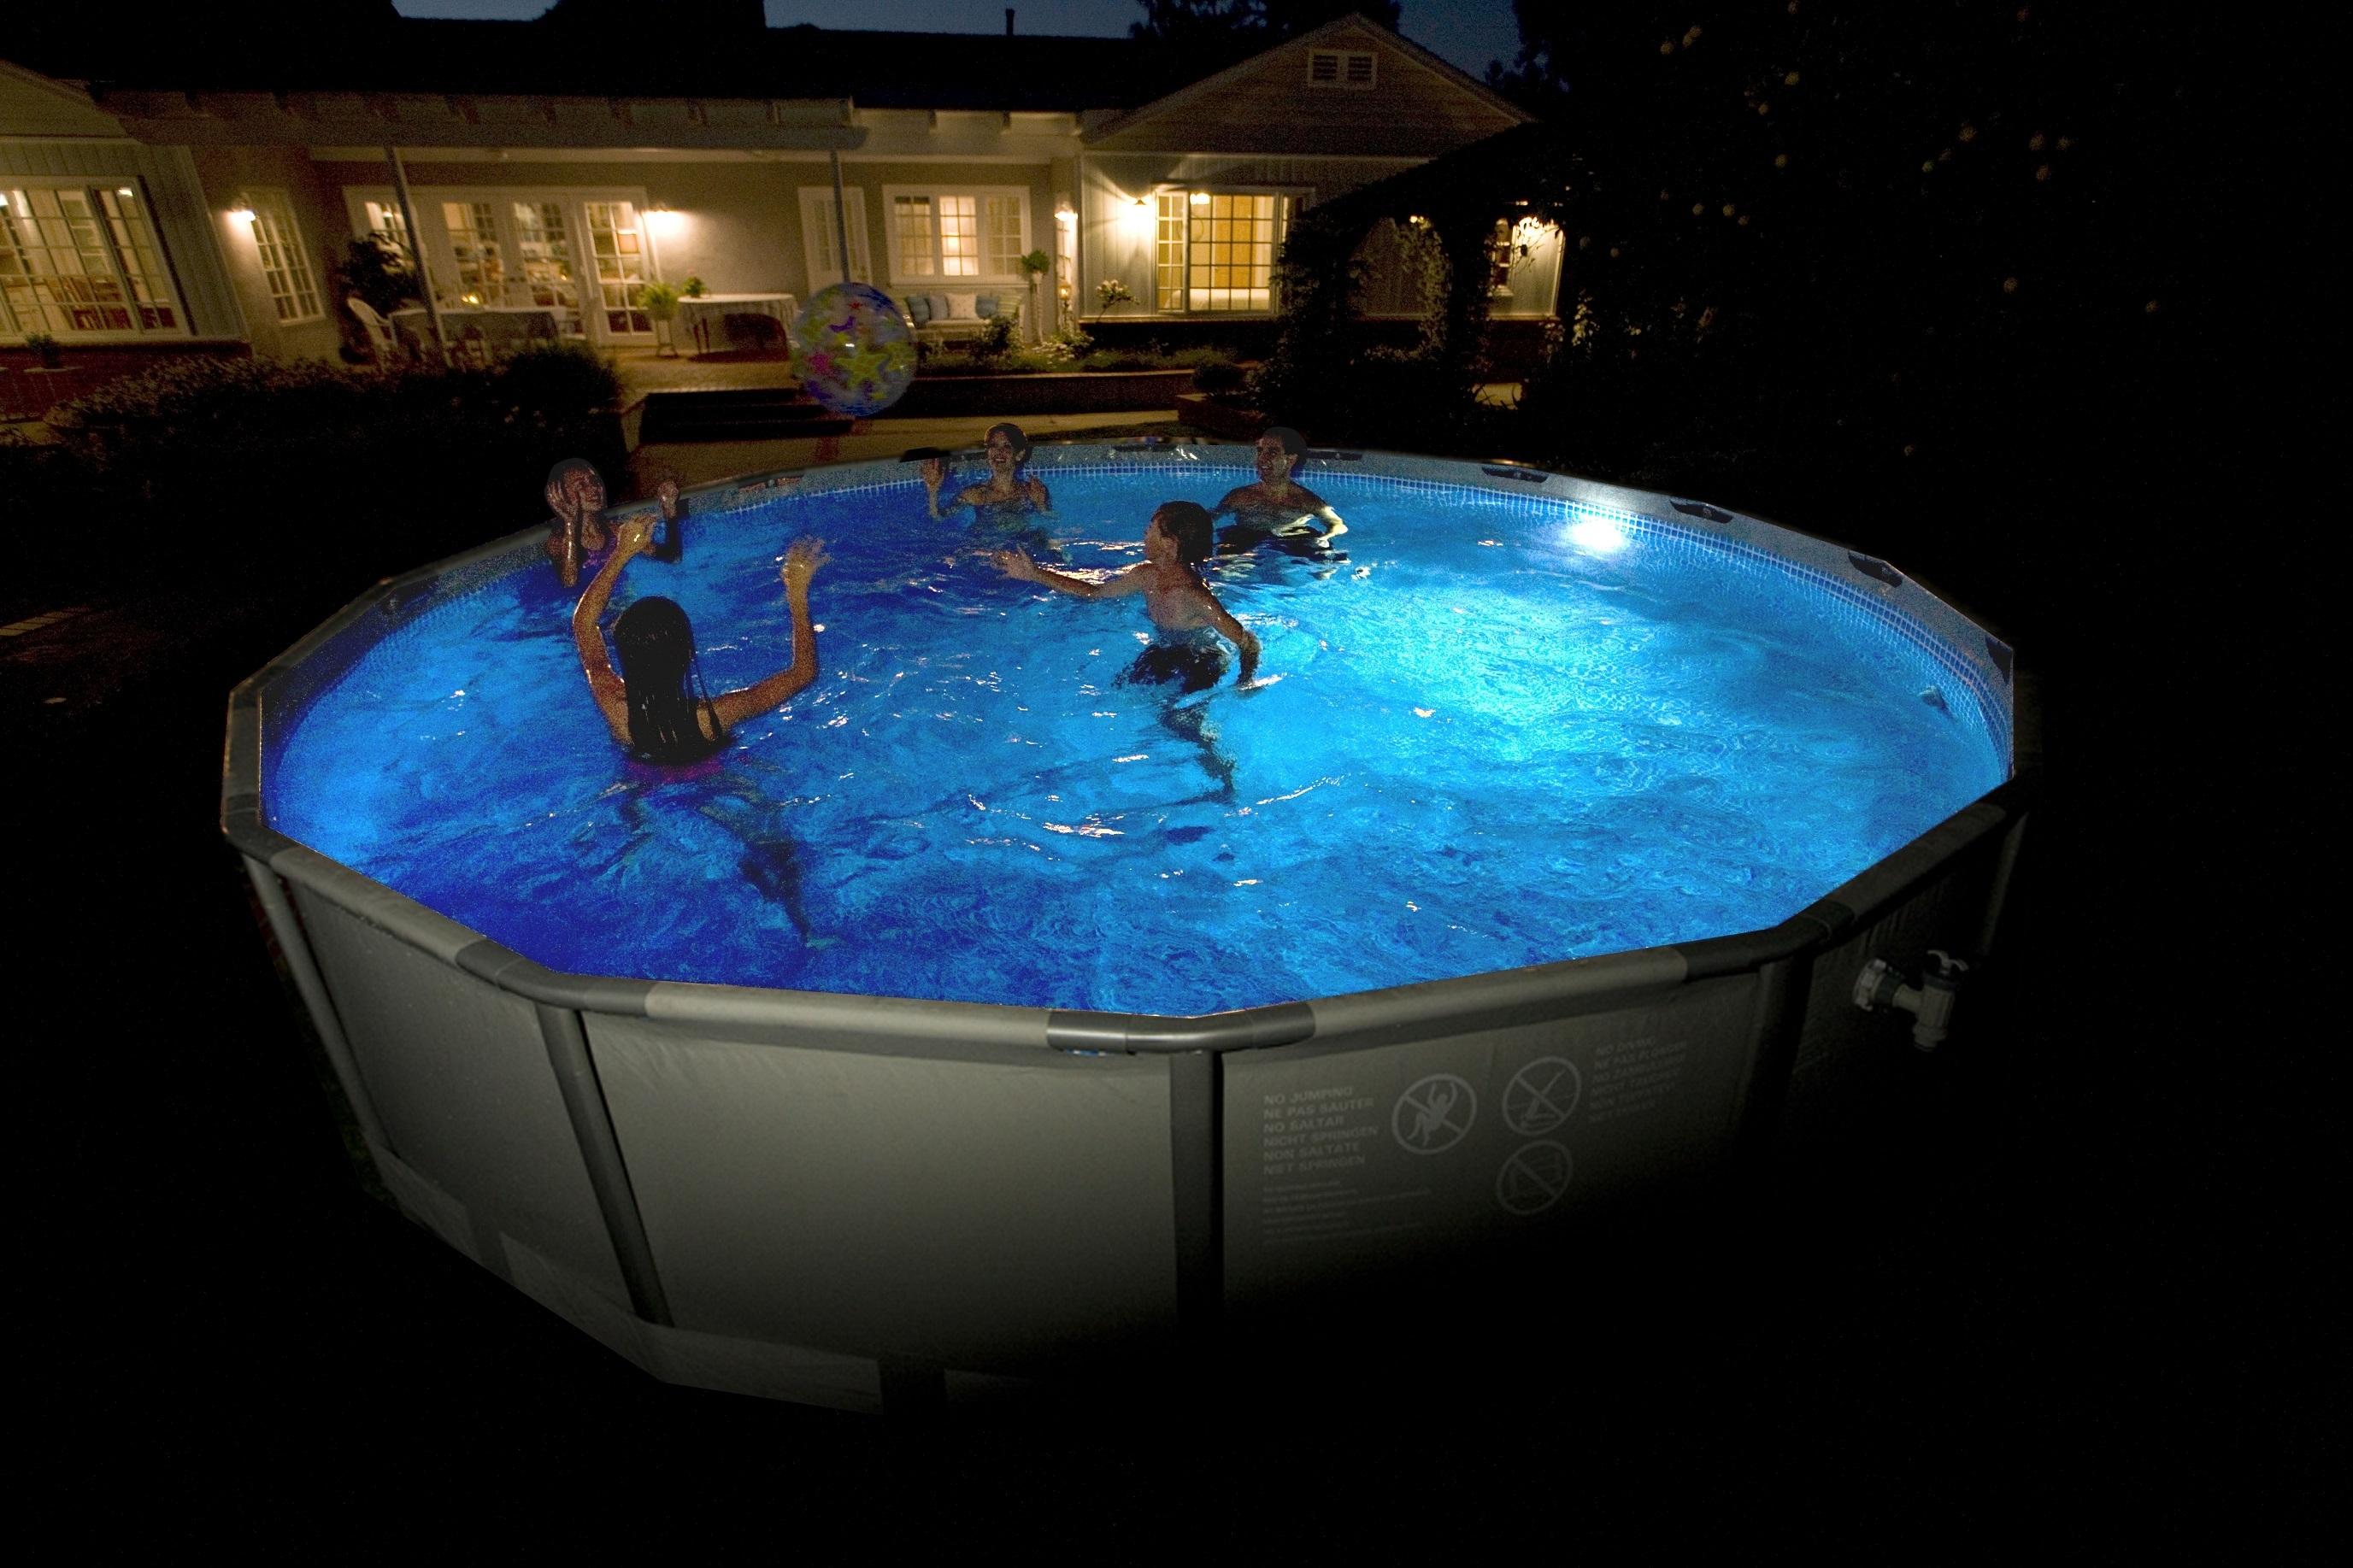 lumiere piscine intex. Black Bedroom Furniture Sets. Home Design Ideas